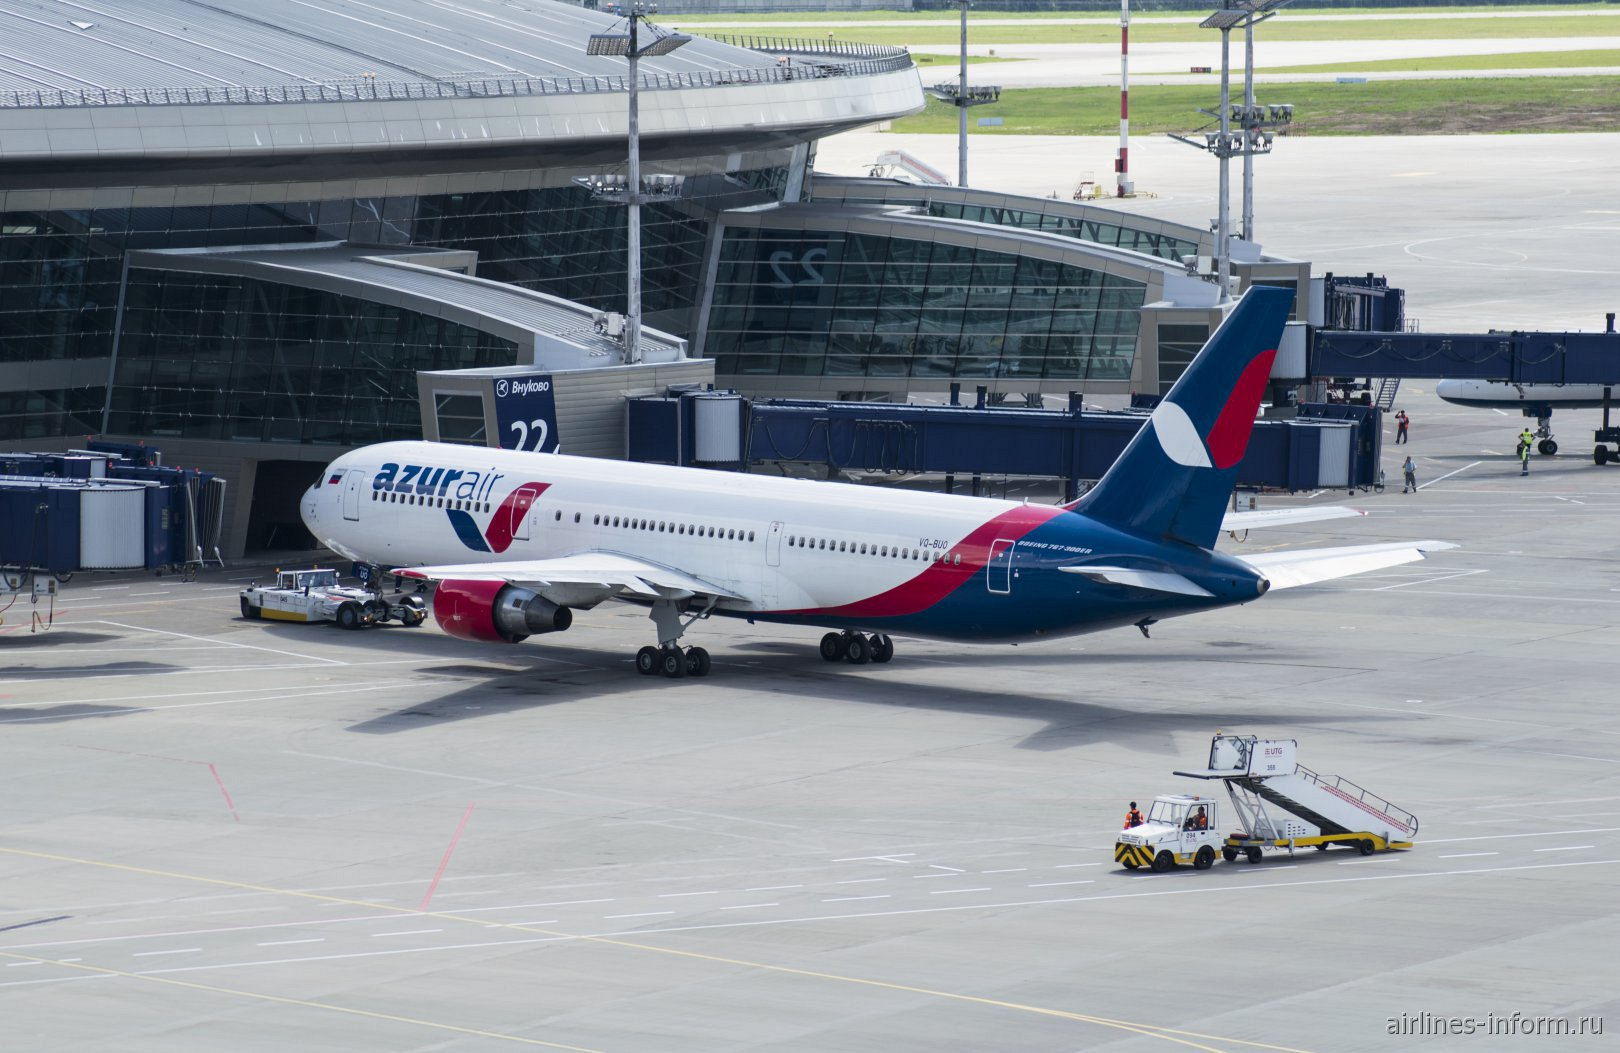 Боинг-767-300 VQ-BUO авиакомпании Azur Air у пассажирского терминала аэропорта Внуково